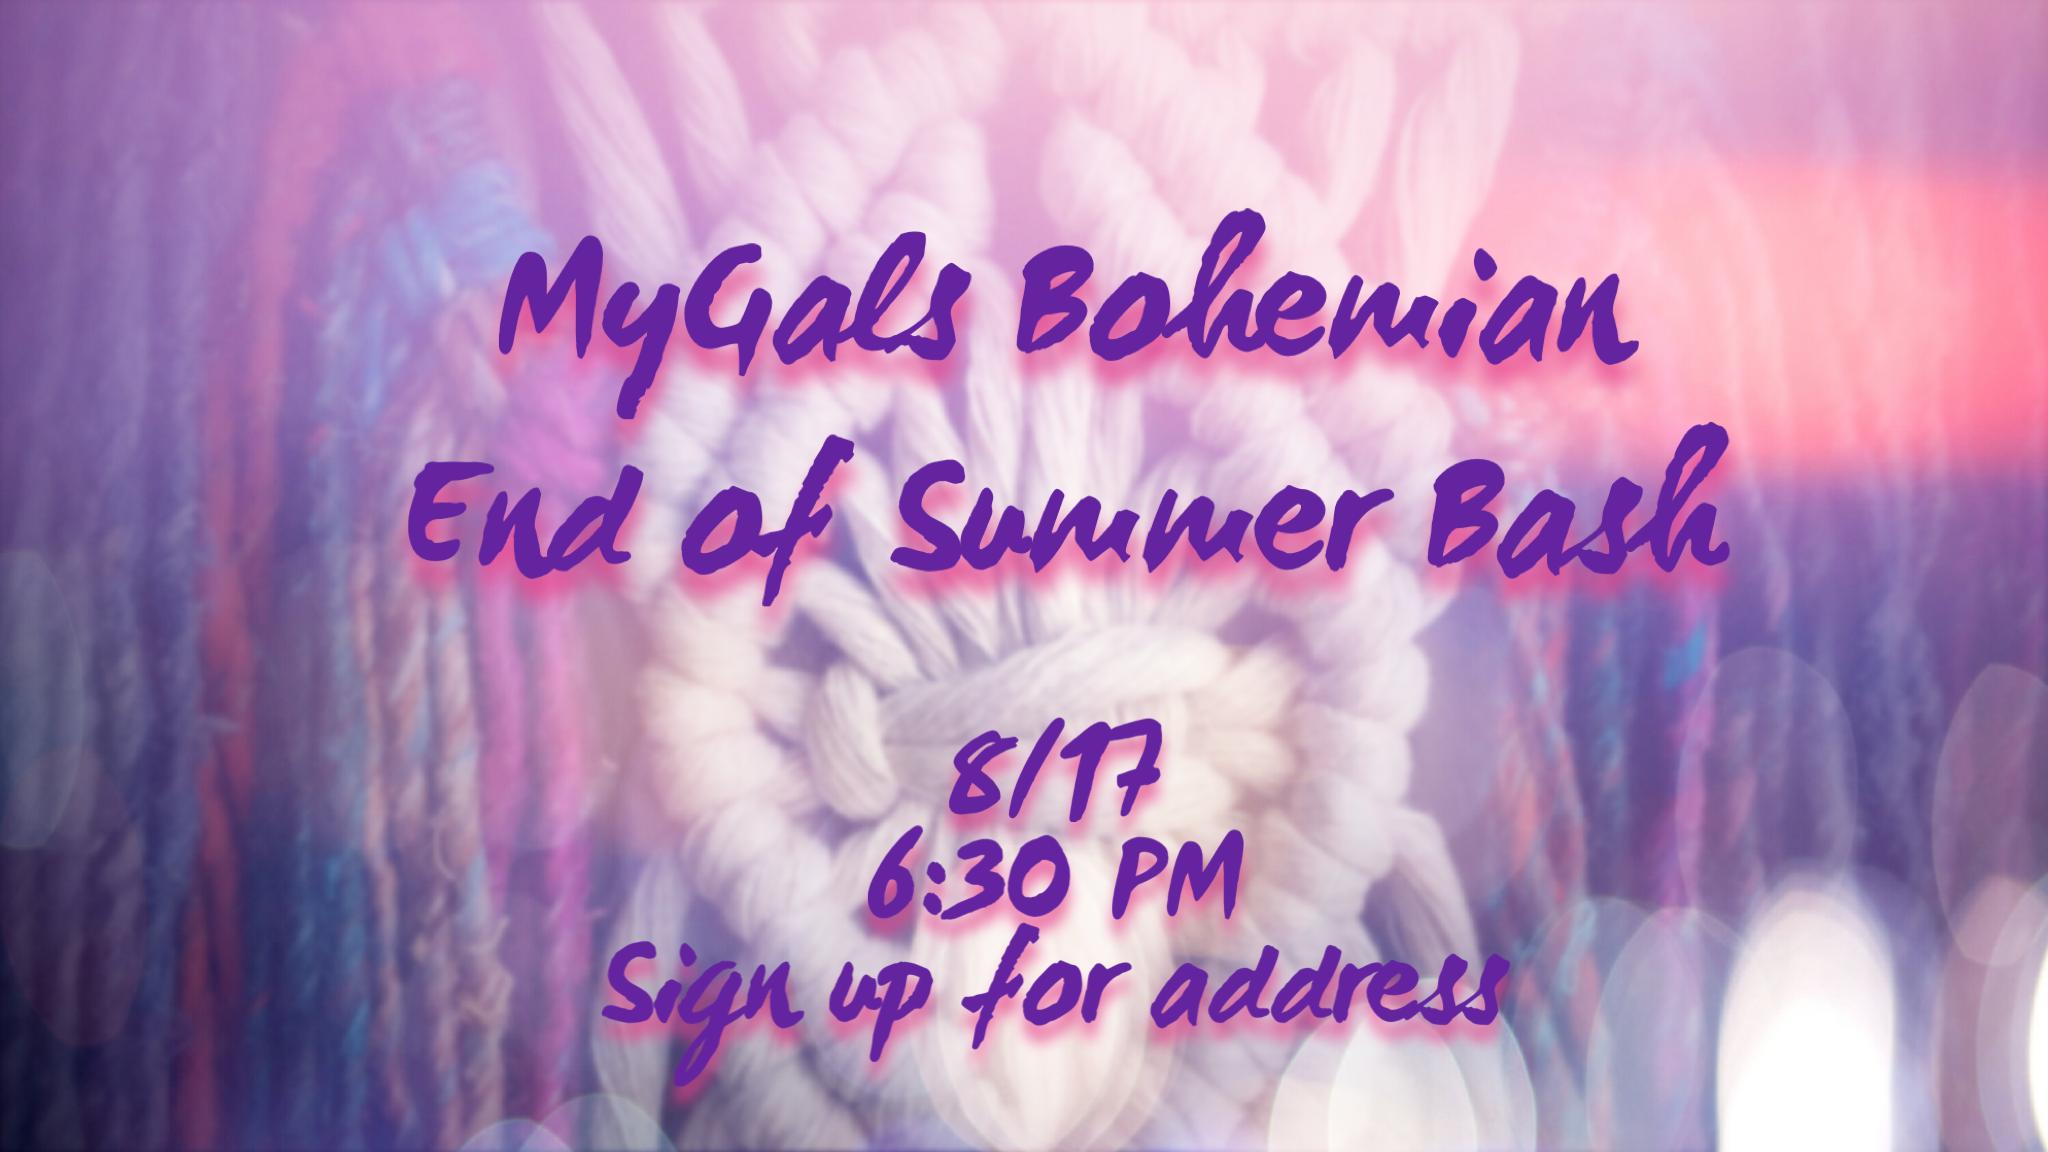 MyGals Bohemian End of Summer Bash